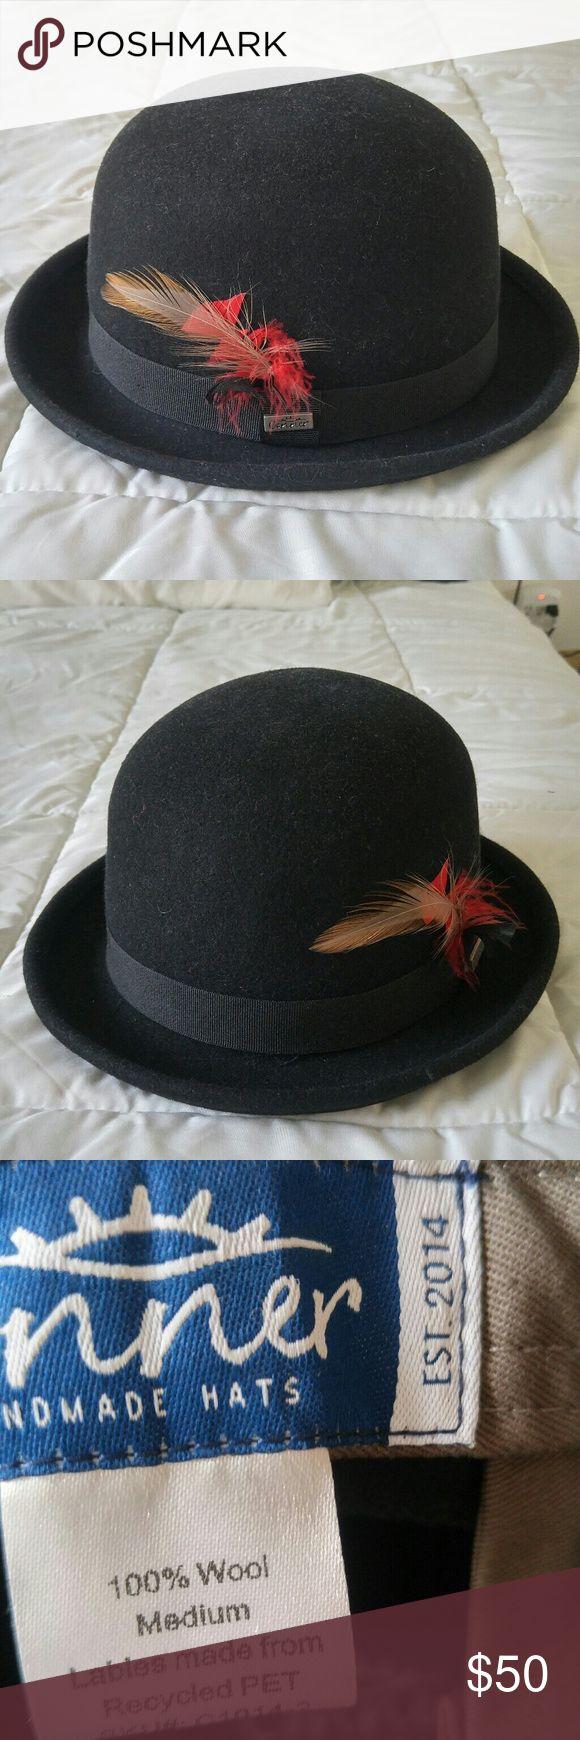 Black Bowler Hat Felt, with hidden pocket. Corner Accessories Hats